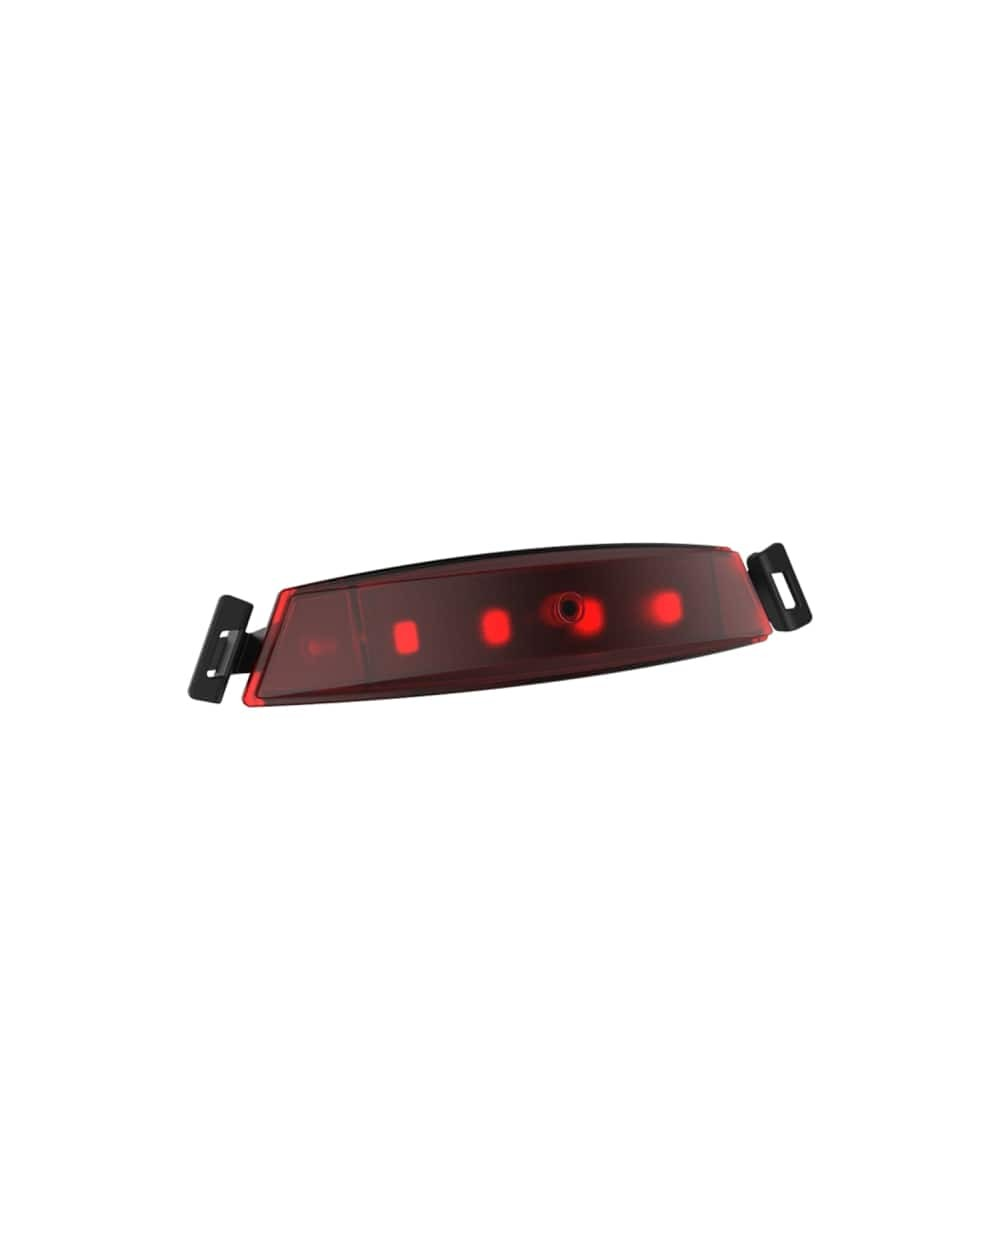 Eclairage USB casque Bern Click-Mount Light